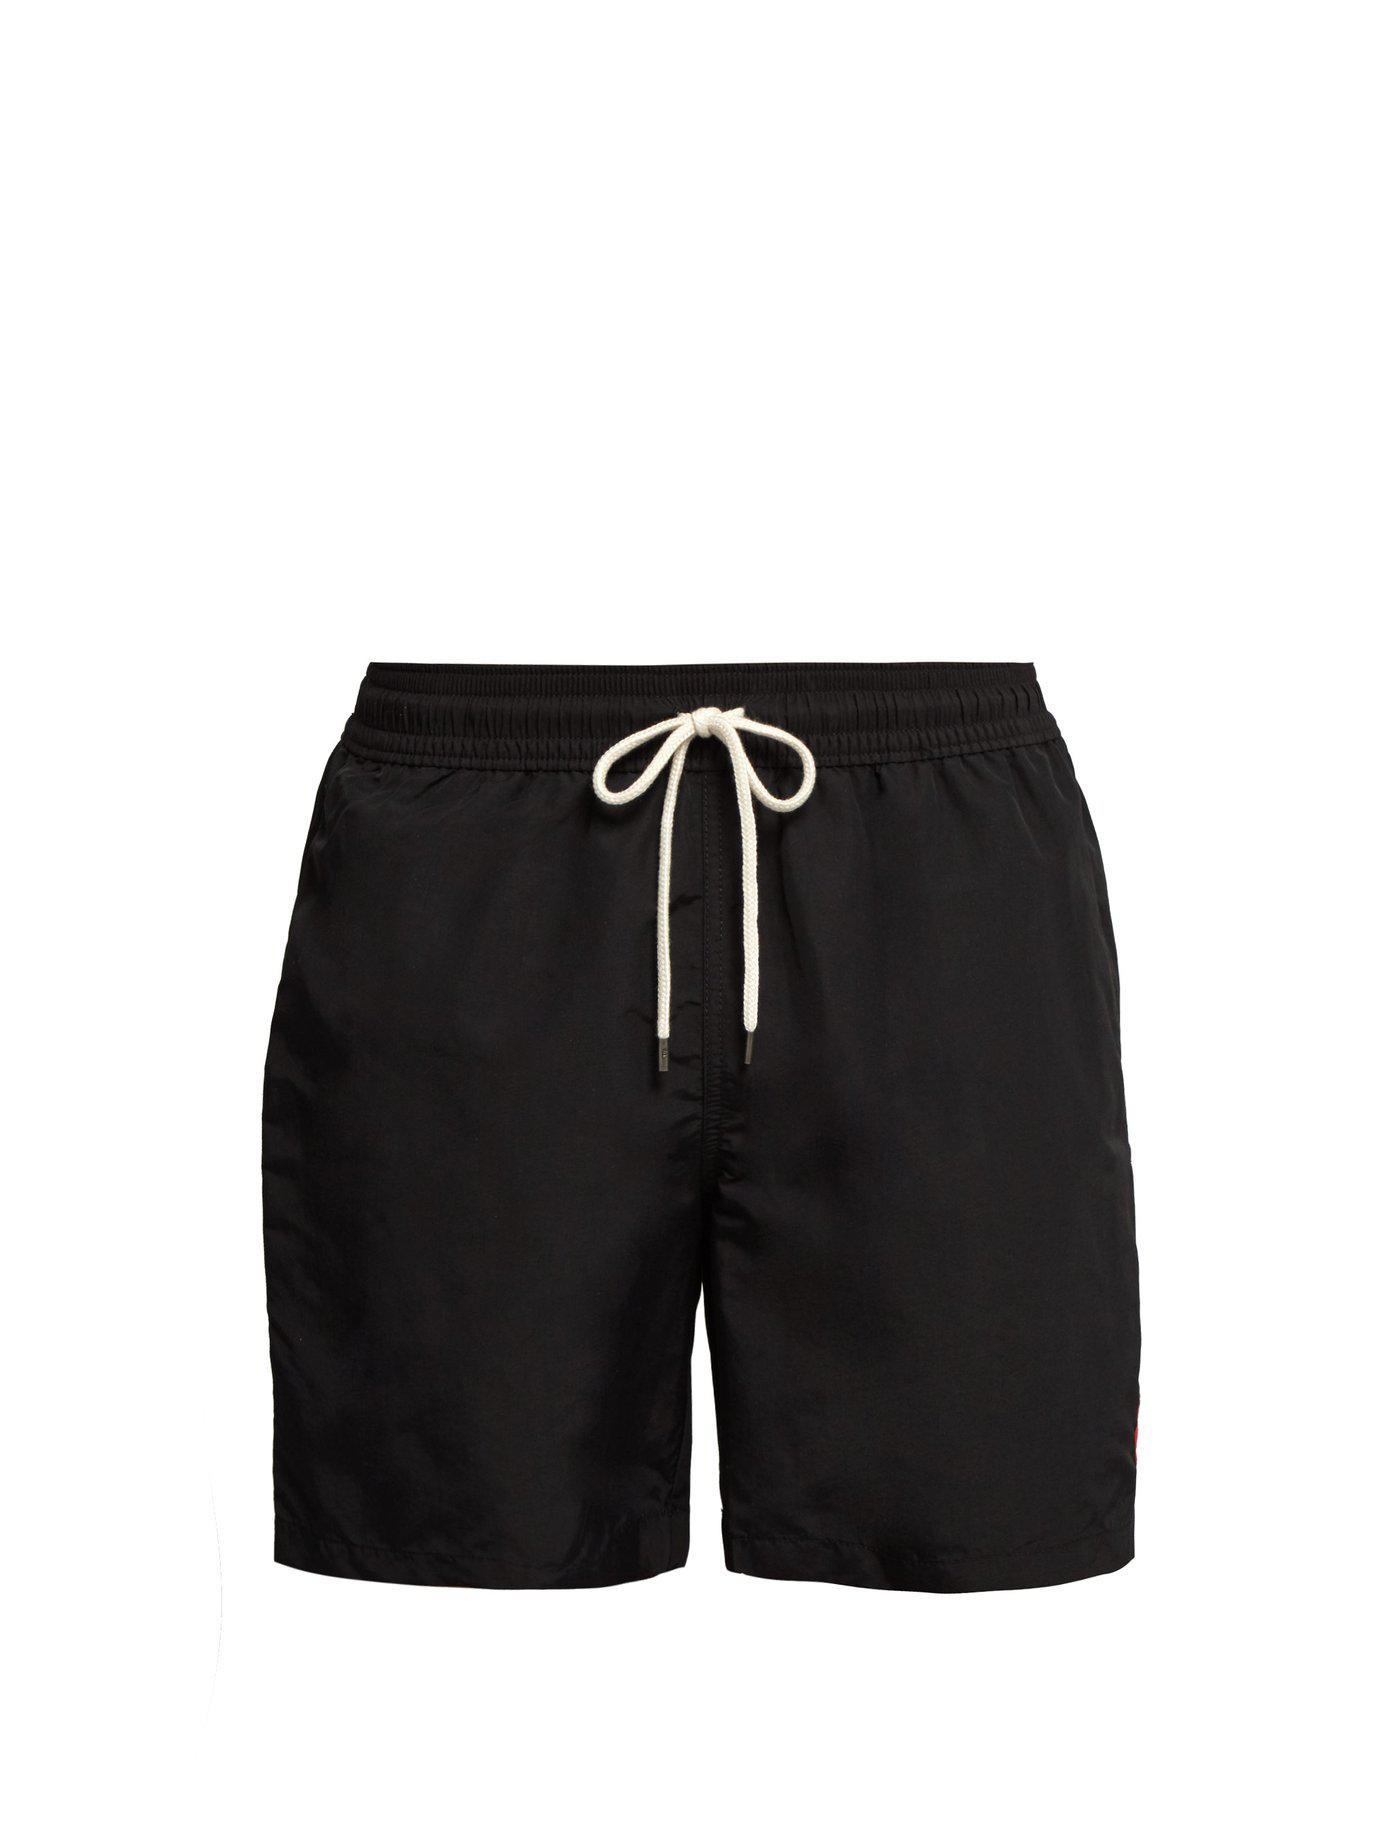 569008d71269c Polo Ralph Lauren - Black Block Coloured Swim Shorts for Men - Lyst. View  fullscreen